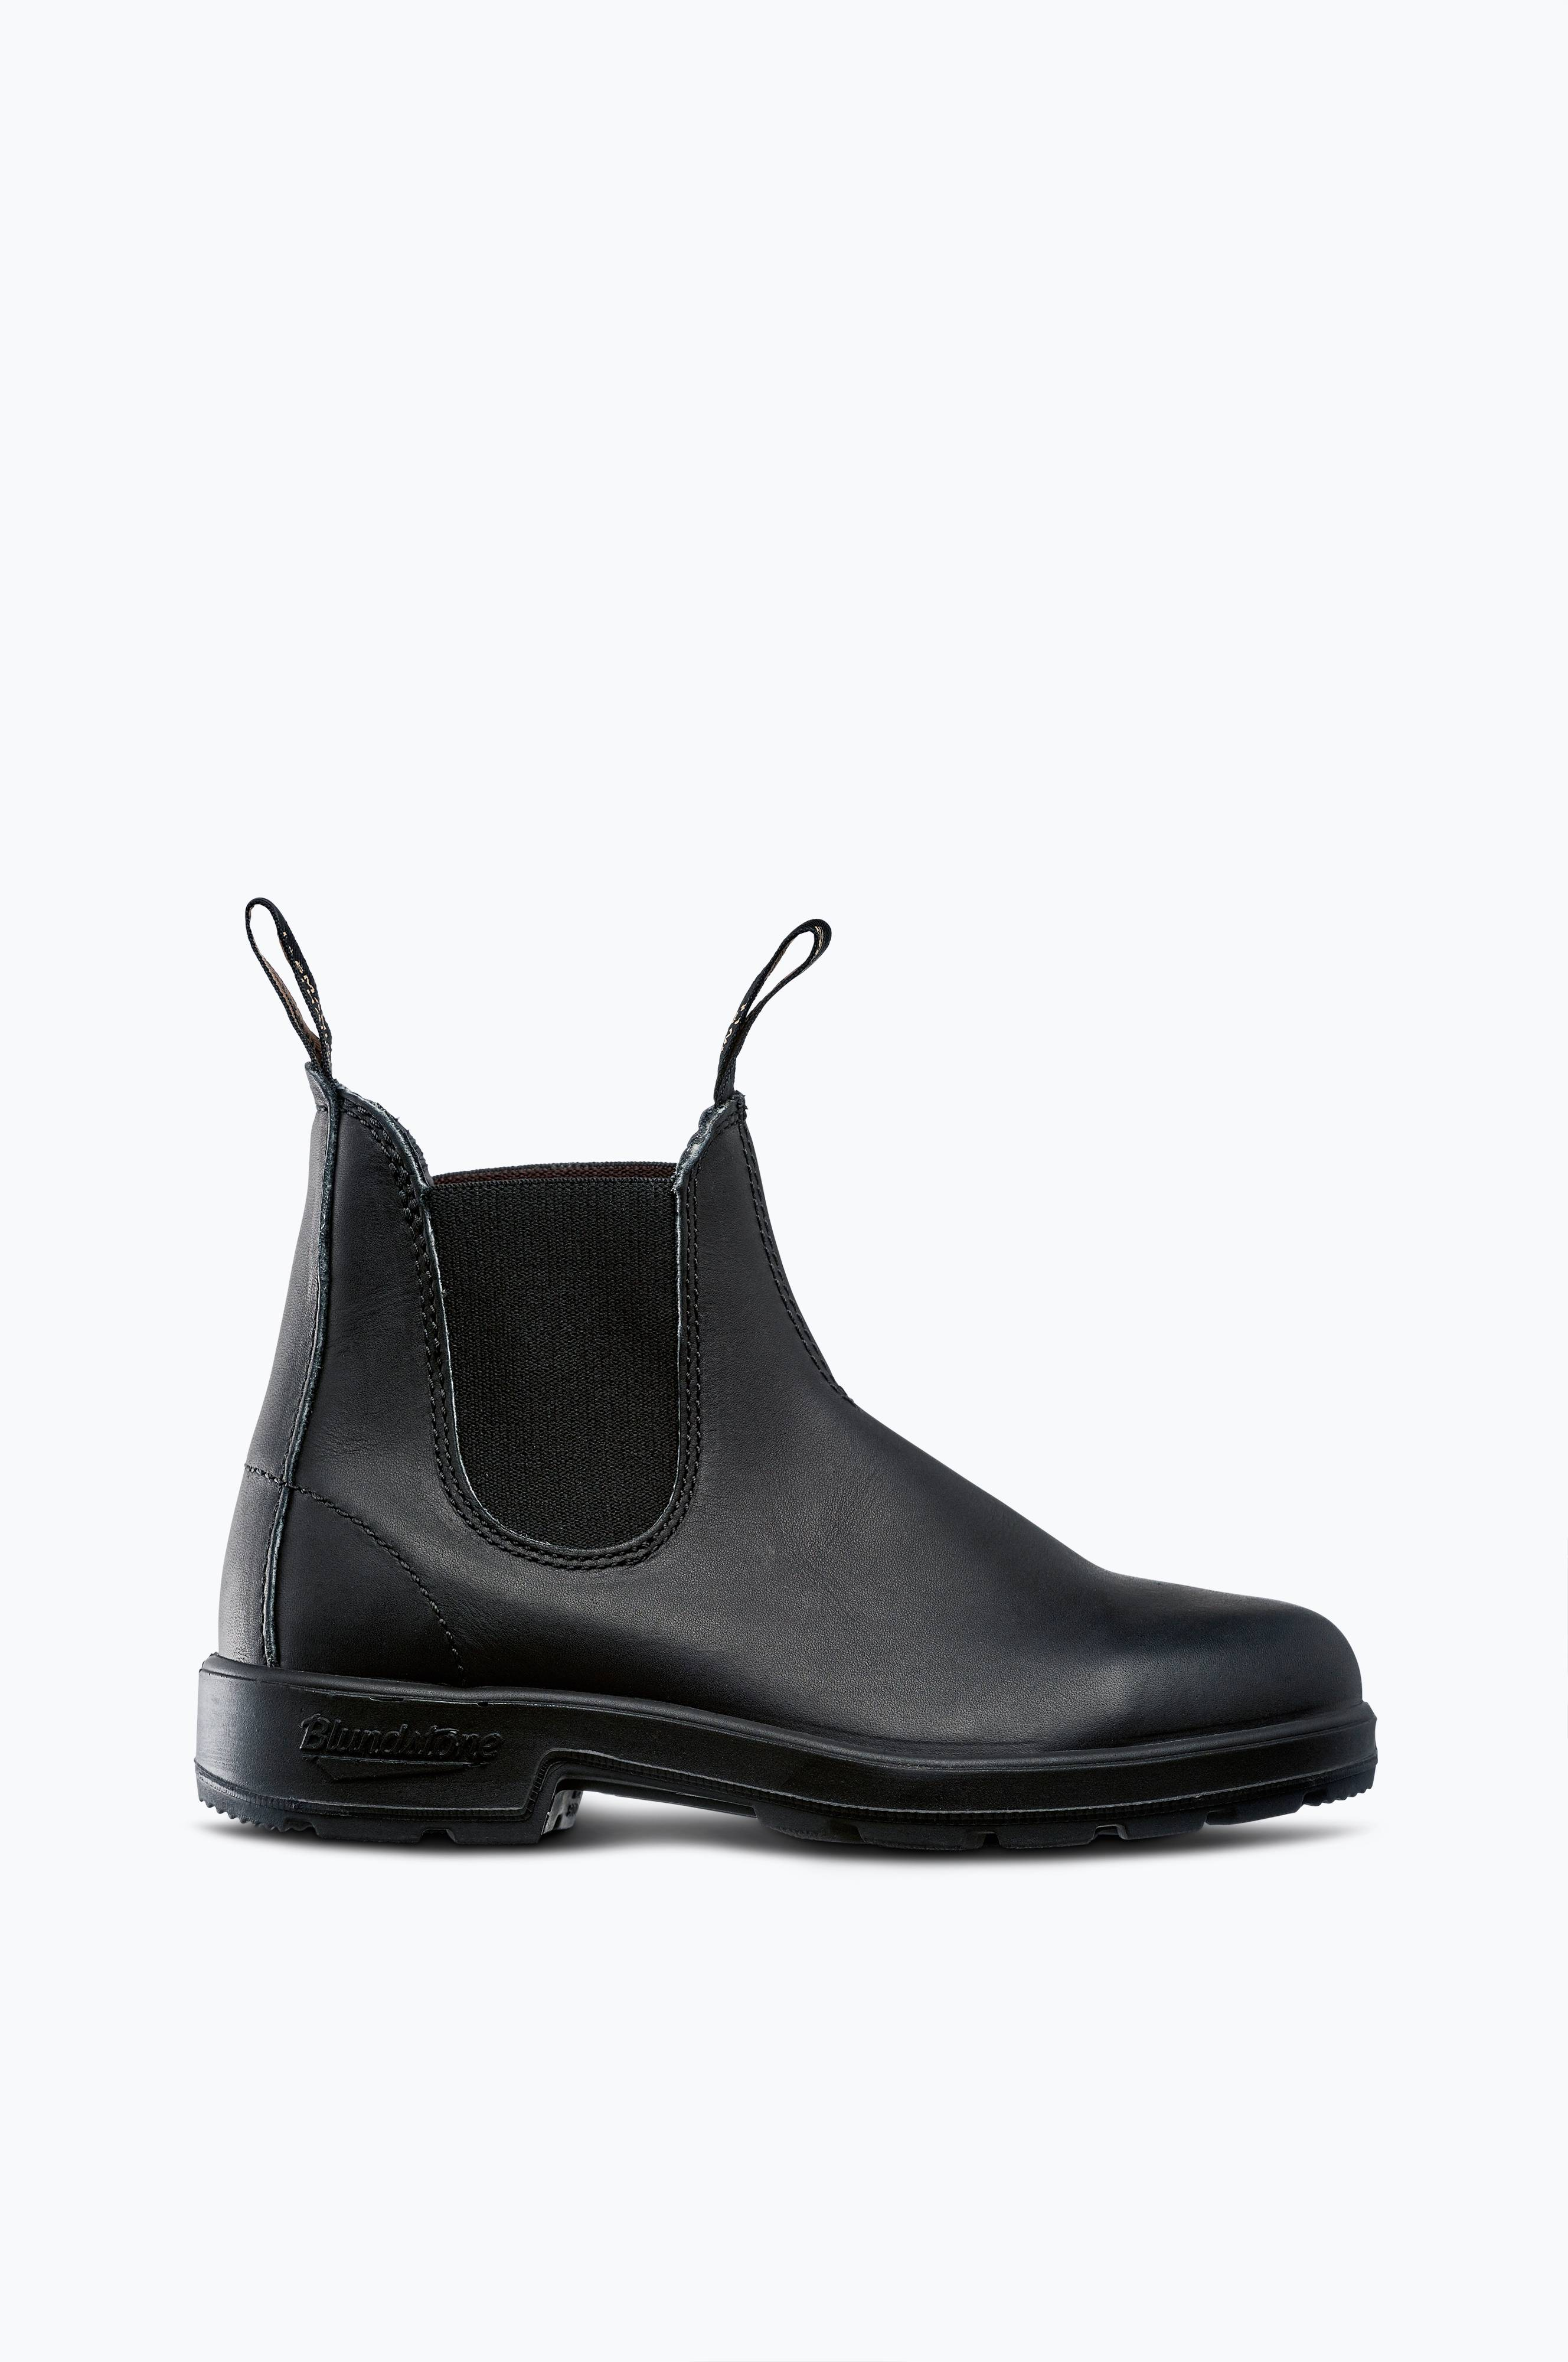 Lækker Blundstone Chelsea-boots Classic 500 - Sort - Herre - Ellos.dk XY-89